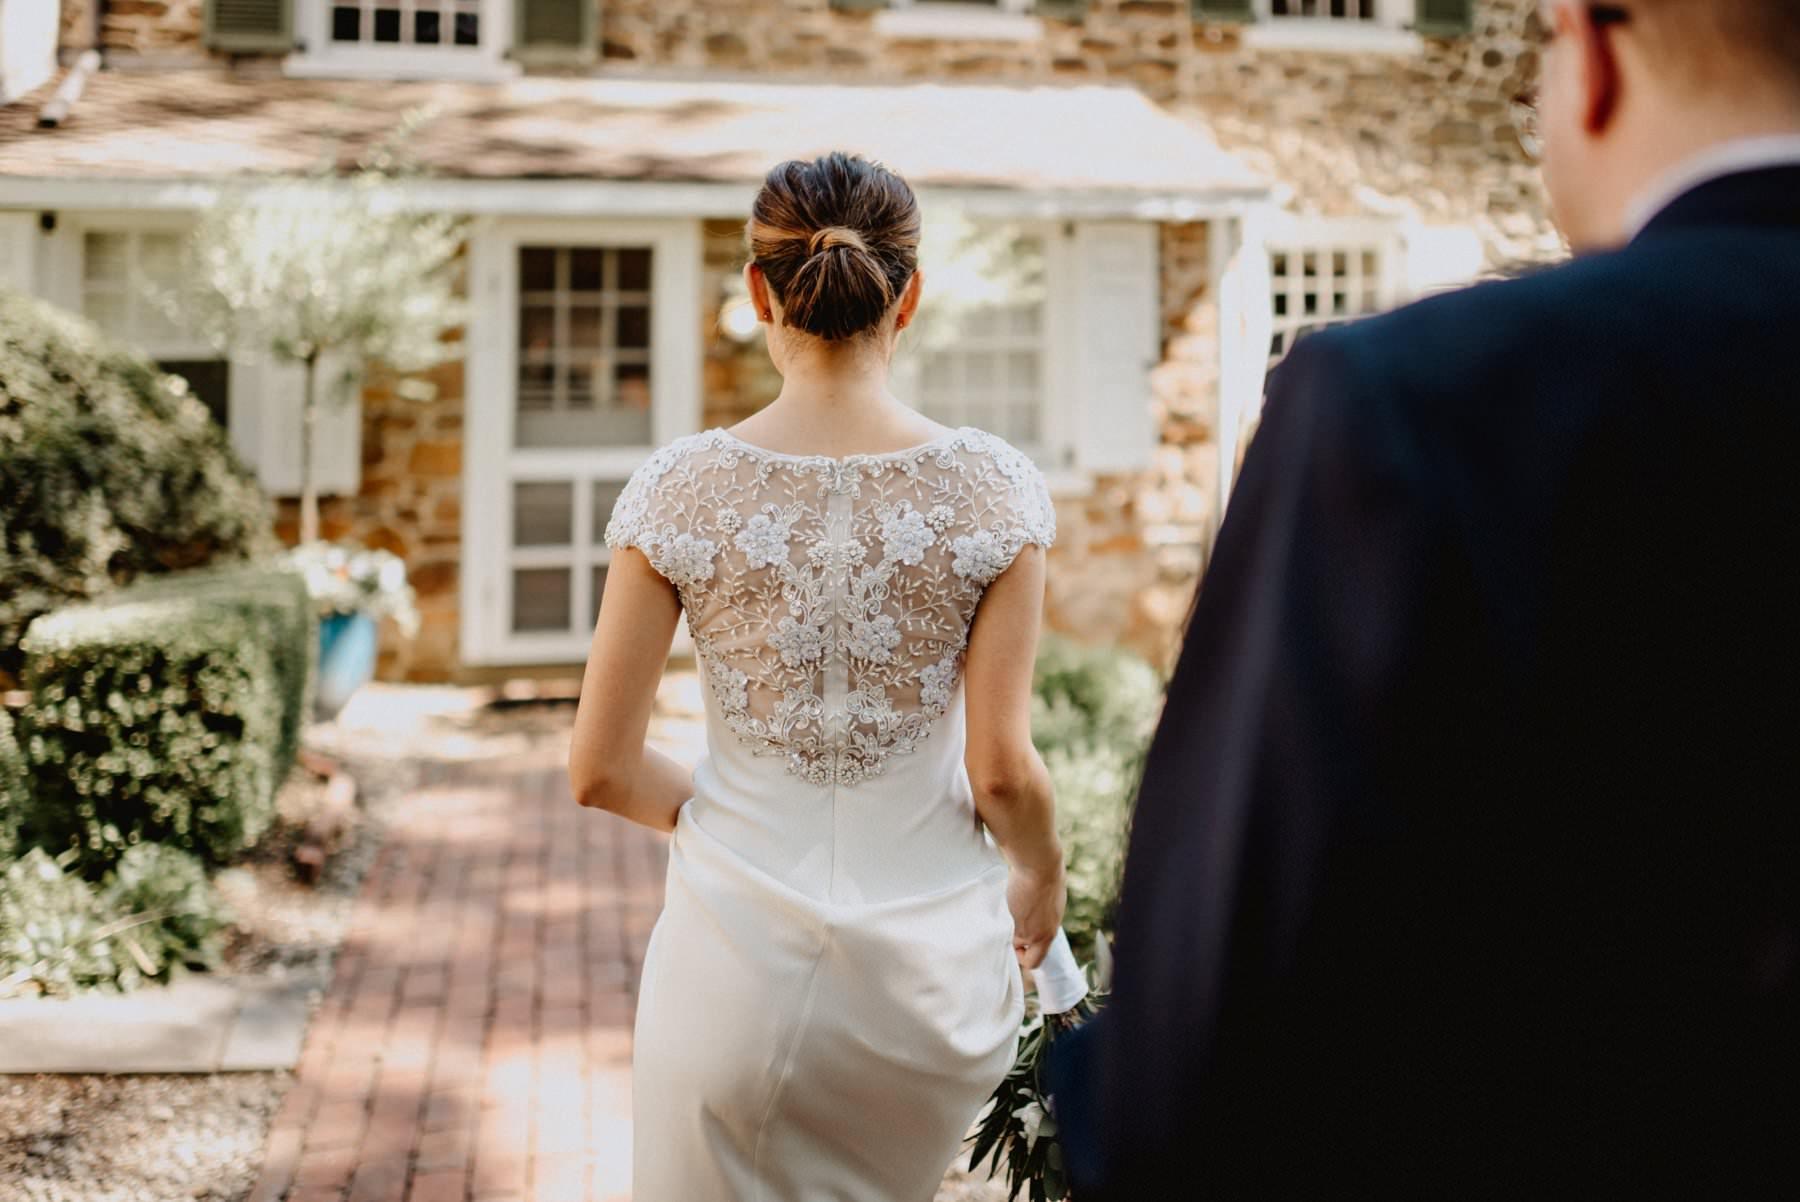 Appleford-estate-wedding-67.jpg